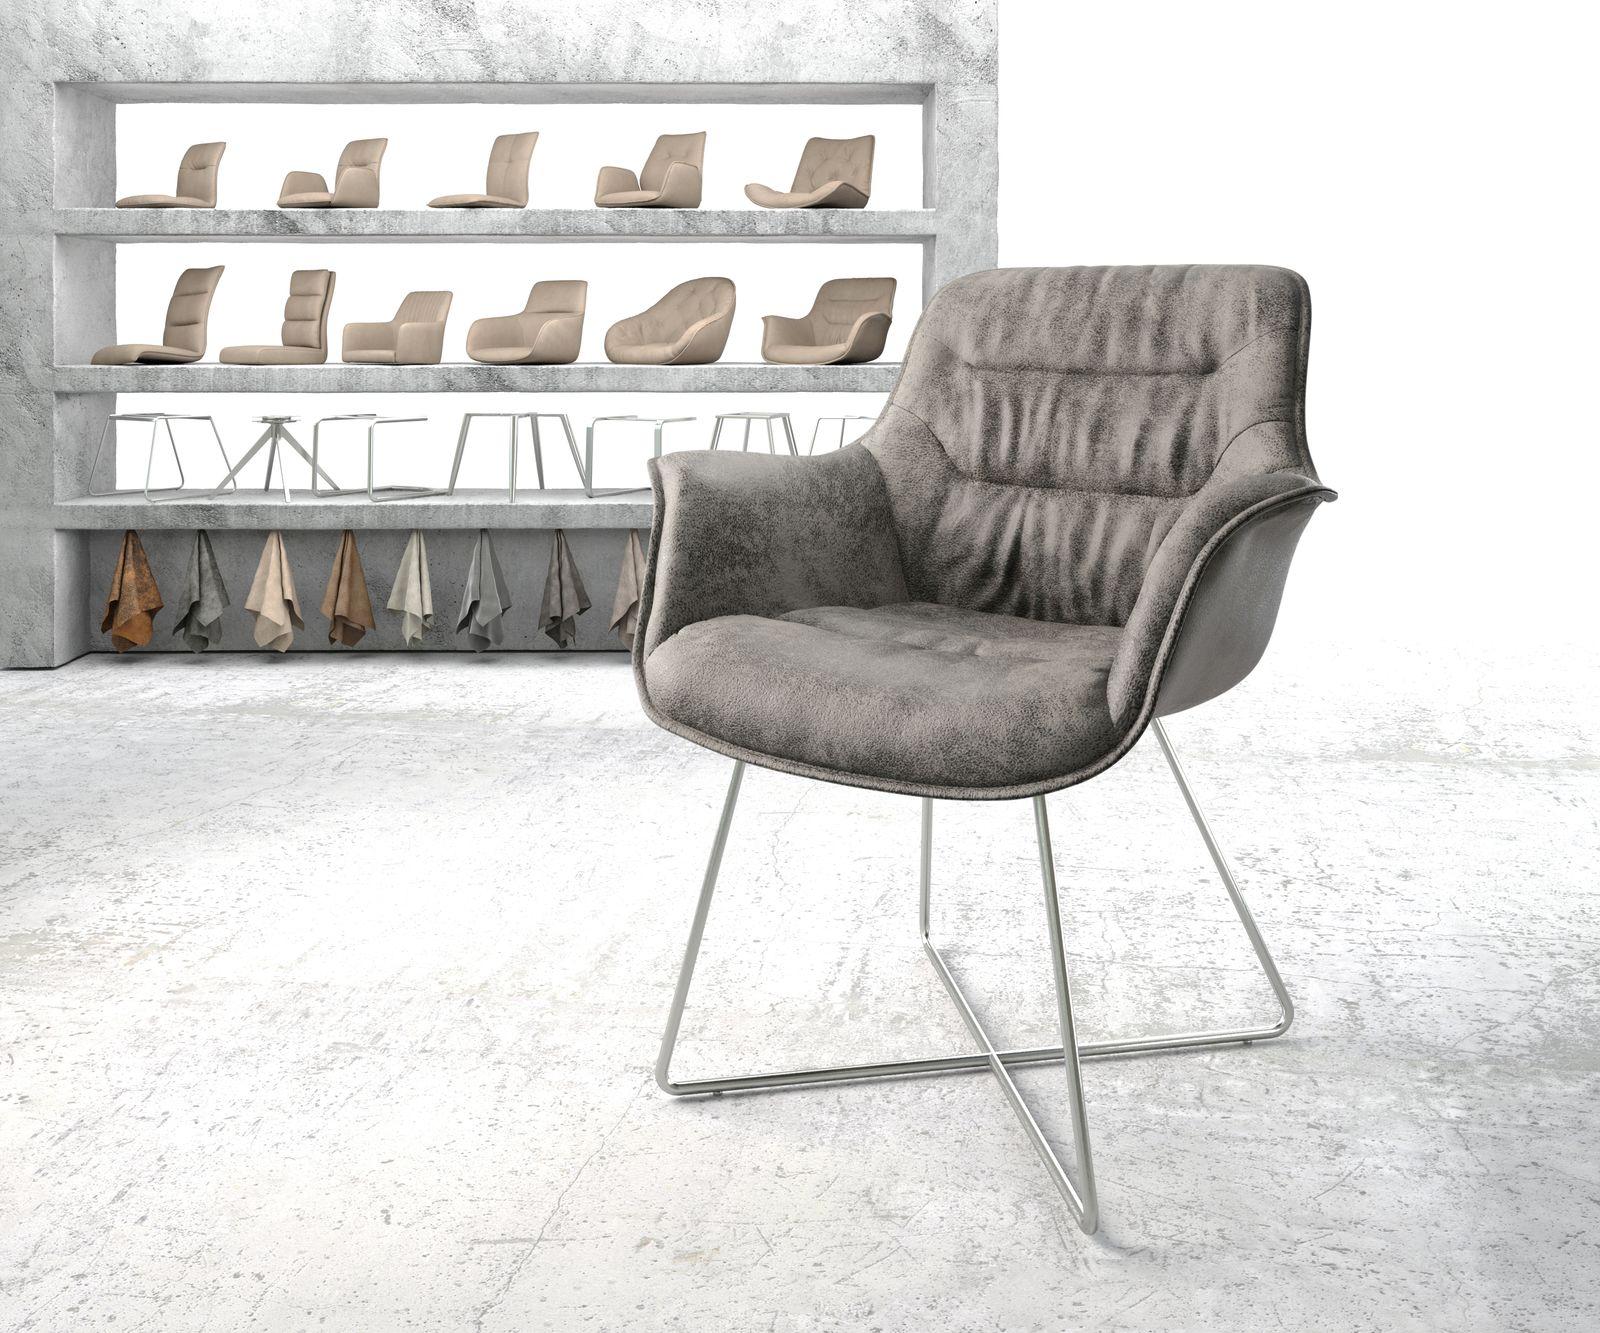 delife-armlehnstuhl-kaira-flex-grau-vintage-x-gestell-edelstahl-esszimmerstuhle